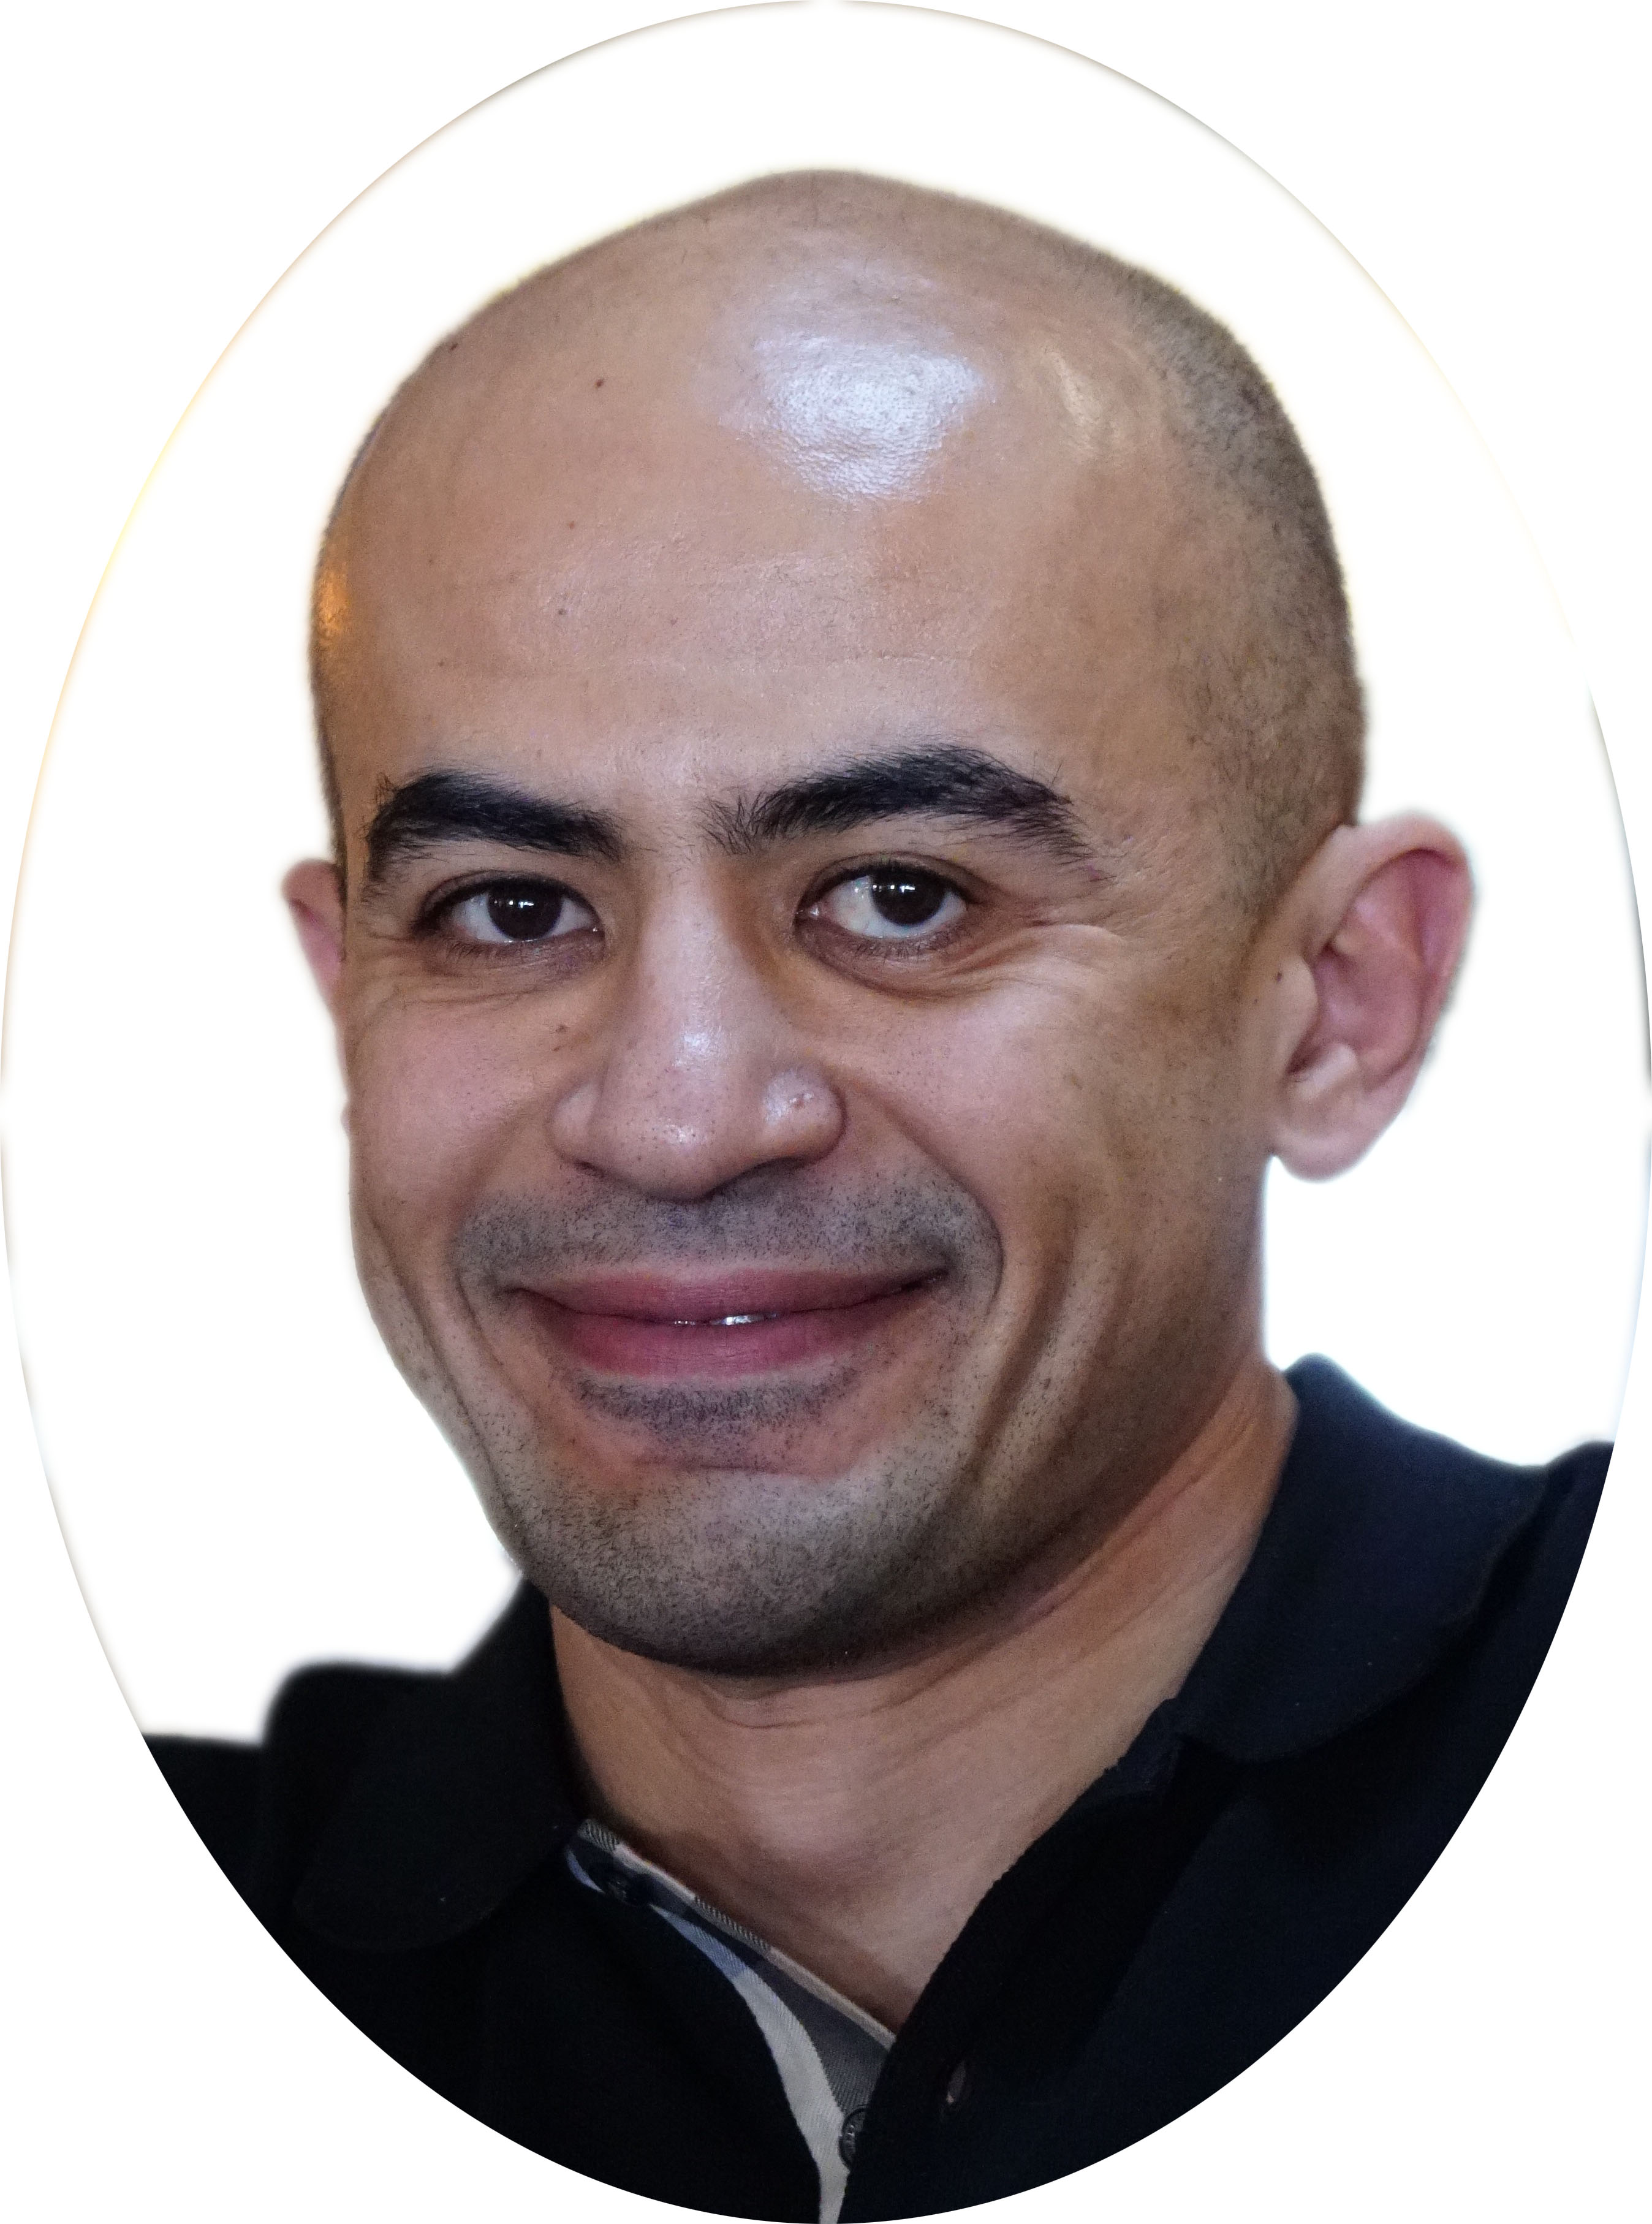 Ahmad Bashir